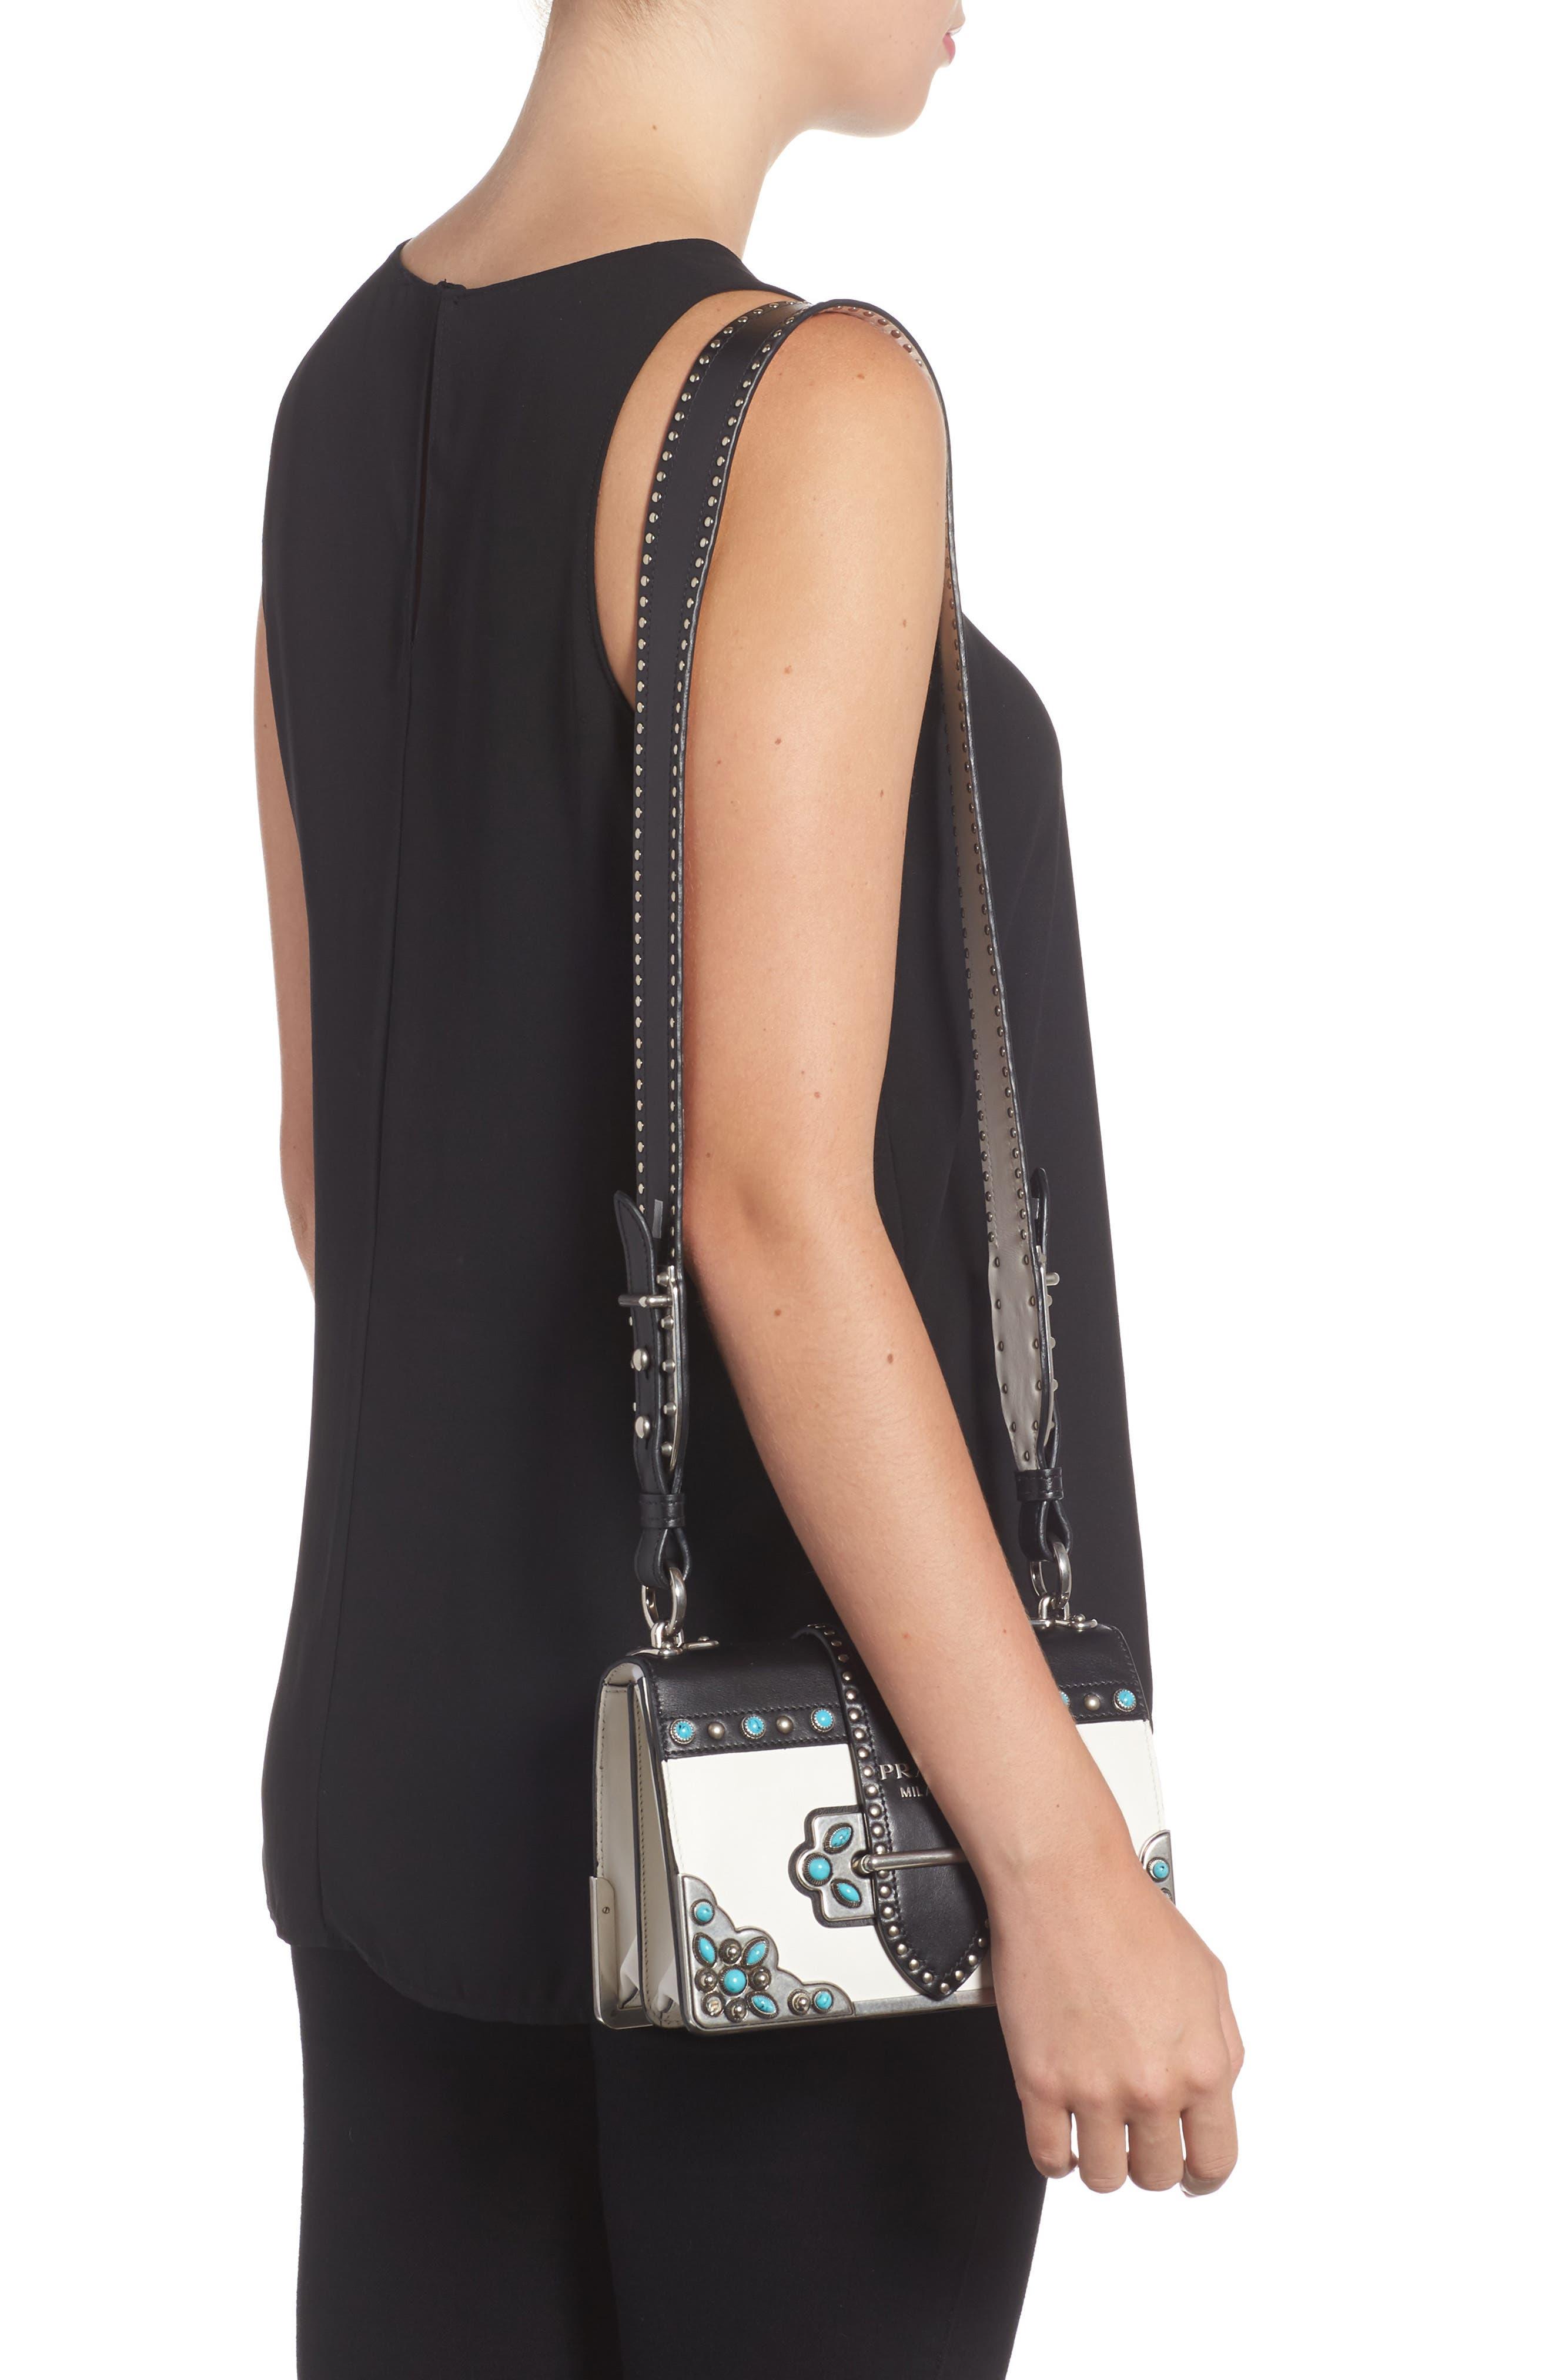 Cahier City Calfskin Shoulder Bag,                             Alternate thumbnail 2, color,                             BIANCO/ NERO